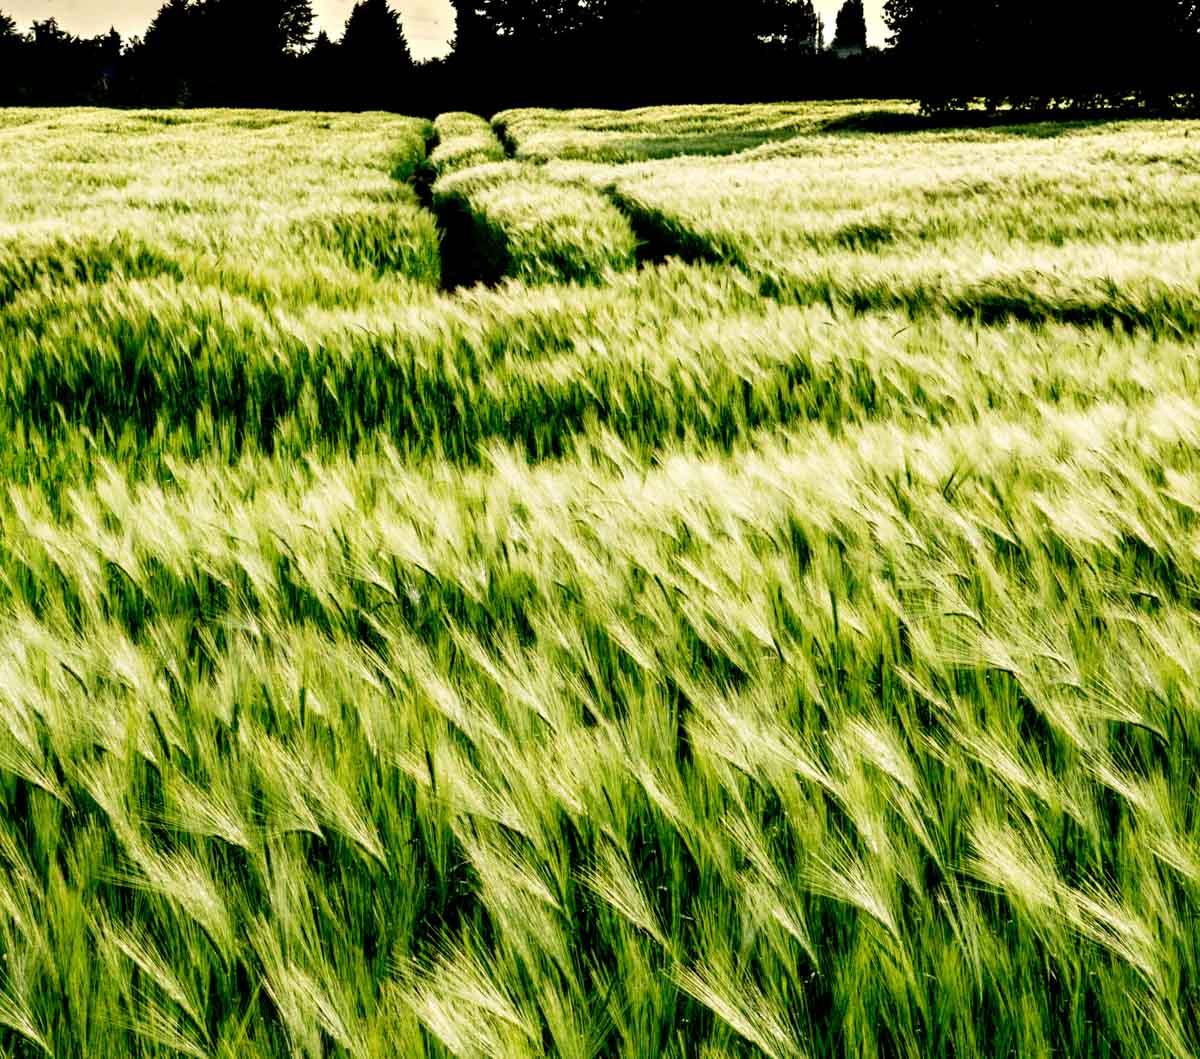 BarrettsField-18-of-20 The Many Glories of Barley